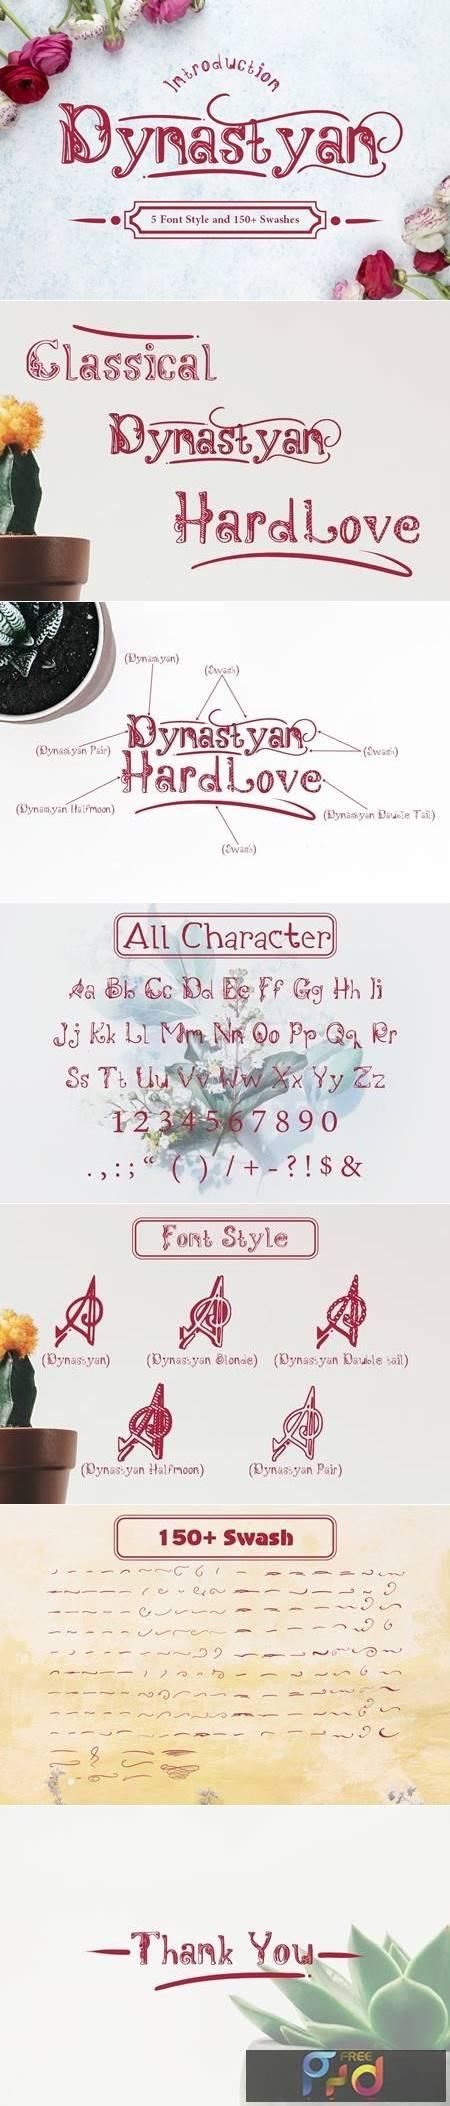 Dynastyan - 5 Font styles 5116330 1